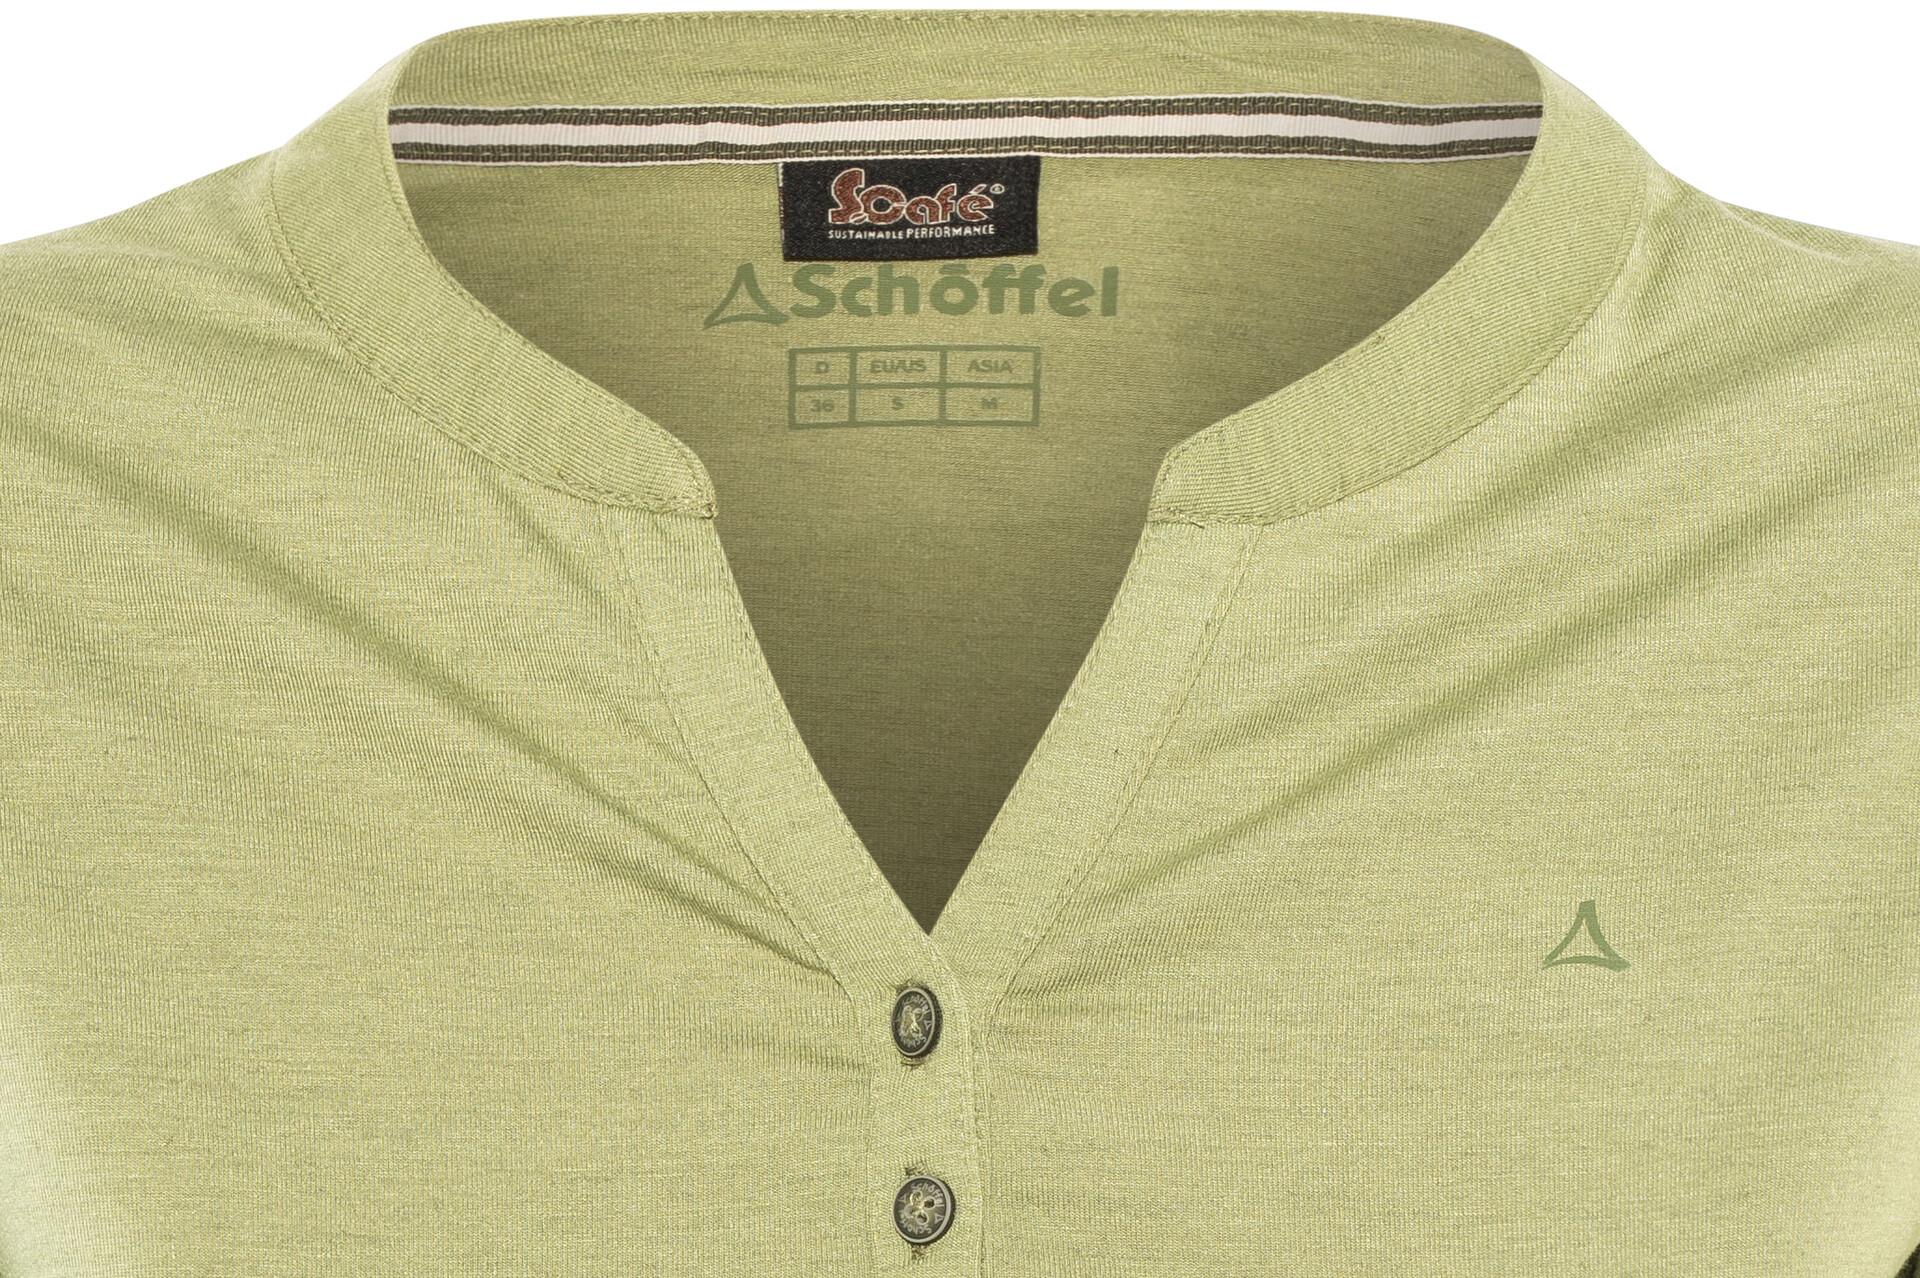 Shirt Schöffel Manches Johannesburg Longues T FemmeMosstone O8n0PwkX